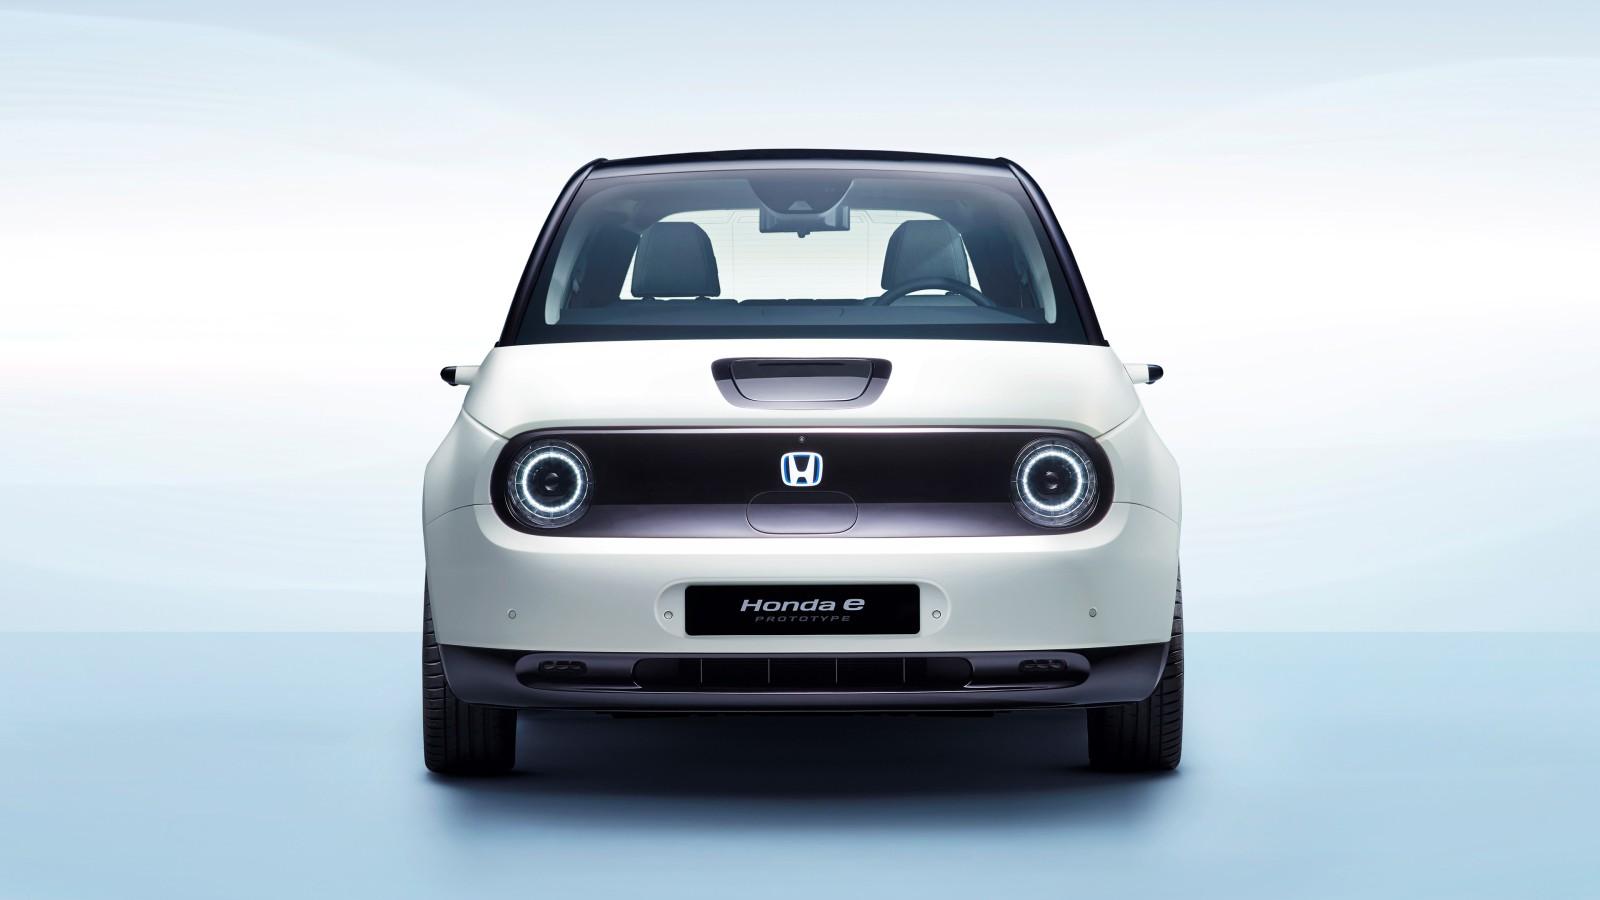 Honda E Prototype 2019 4k Wallpaper Hd Car Wallpapers